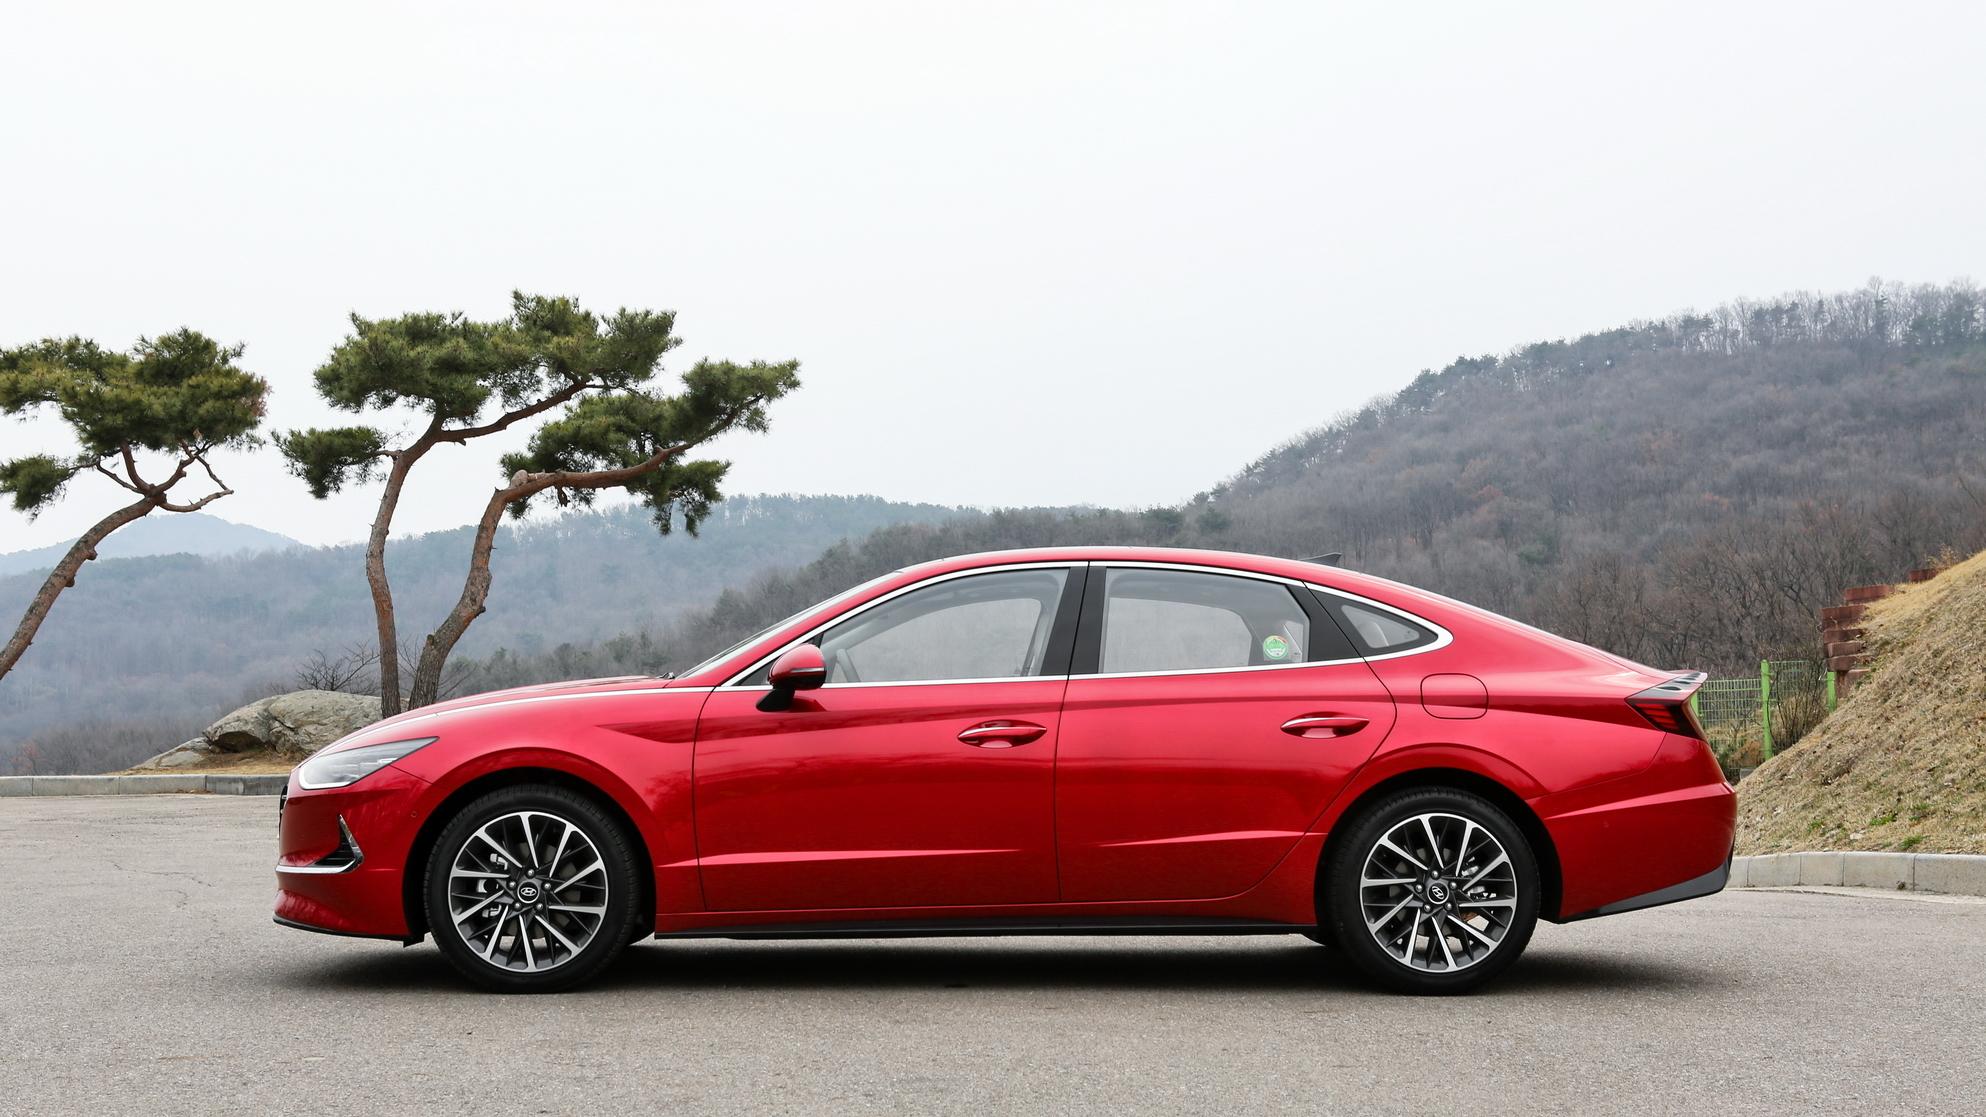 2020 Hyundai Sonata will emit less with new valve-duration tech